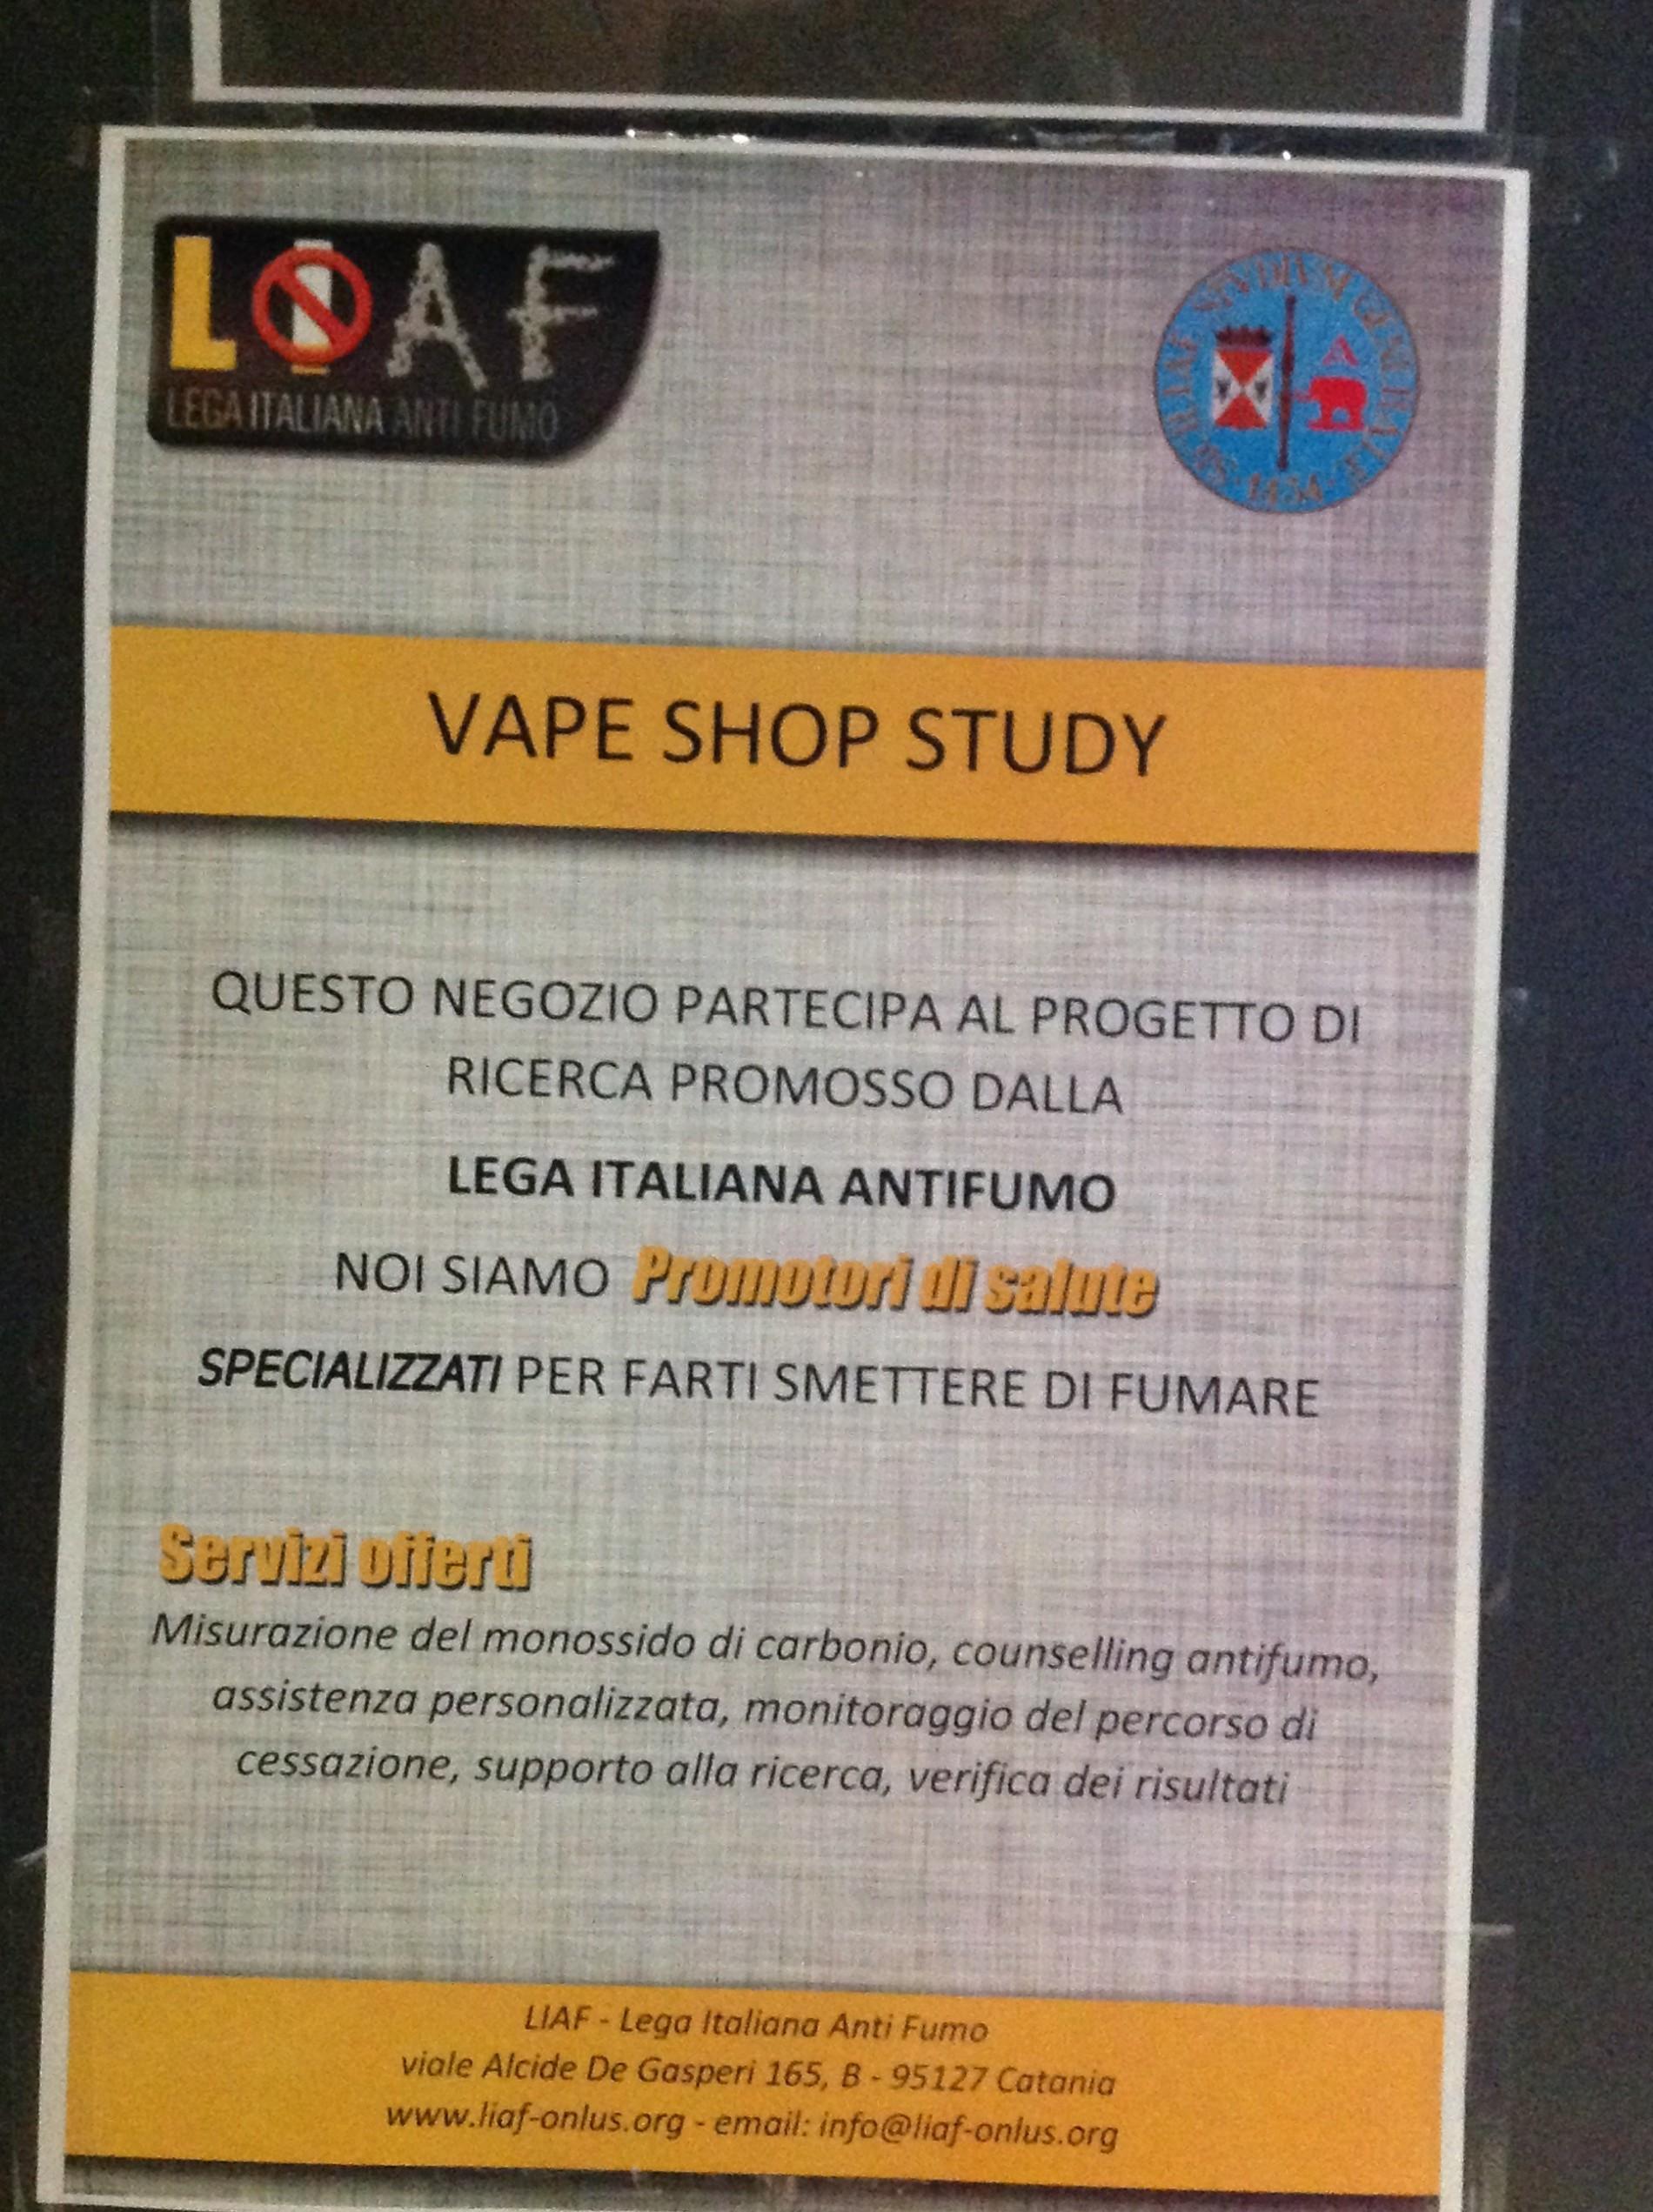 Vape Shop Study – Milano 10 Maggio 2015